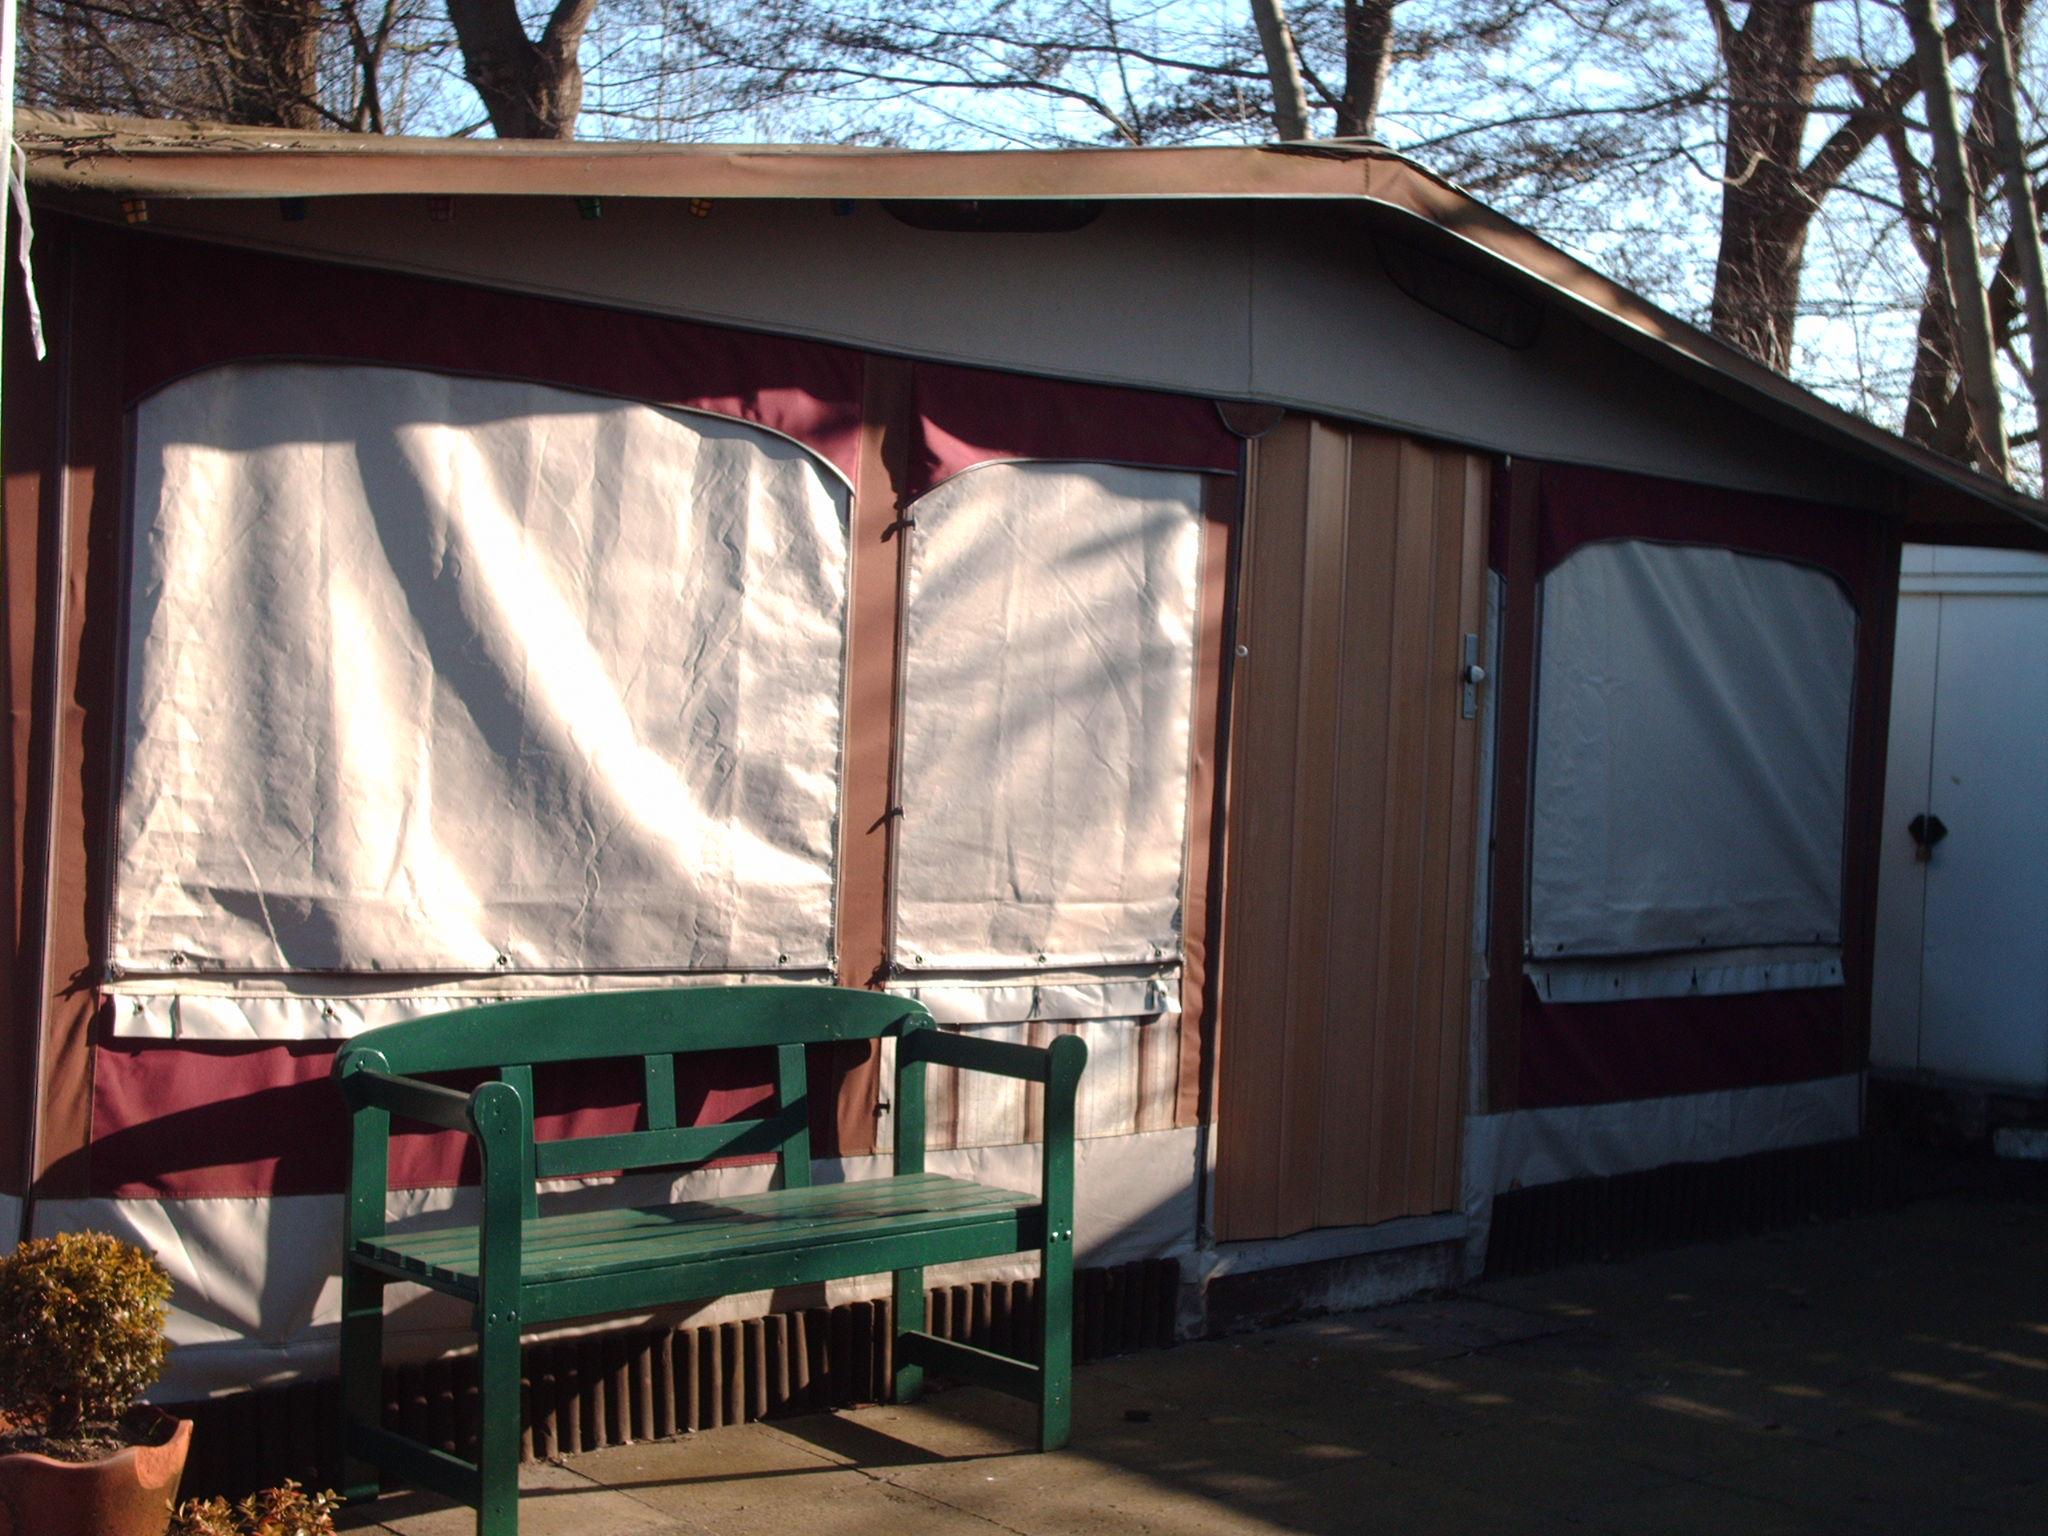 camping kleinanzeigen in hannover. Black Bedroom Furniture Sets. Home Design Ideas